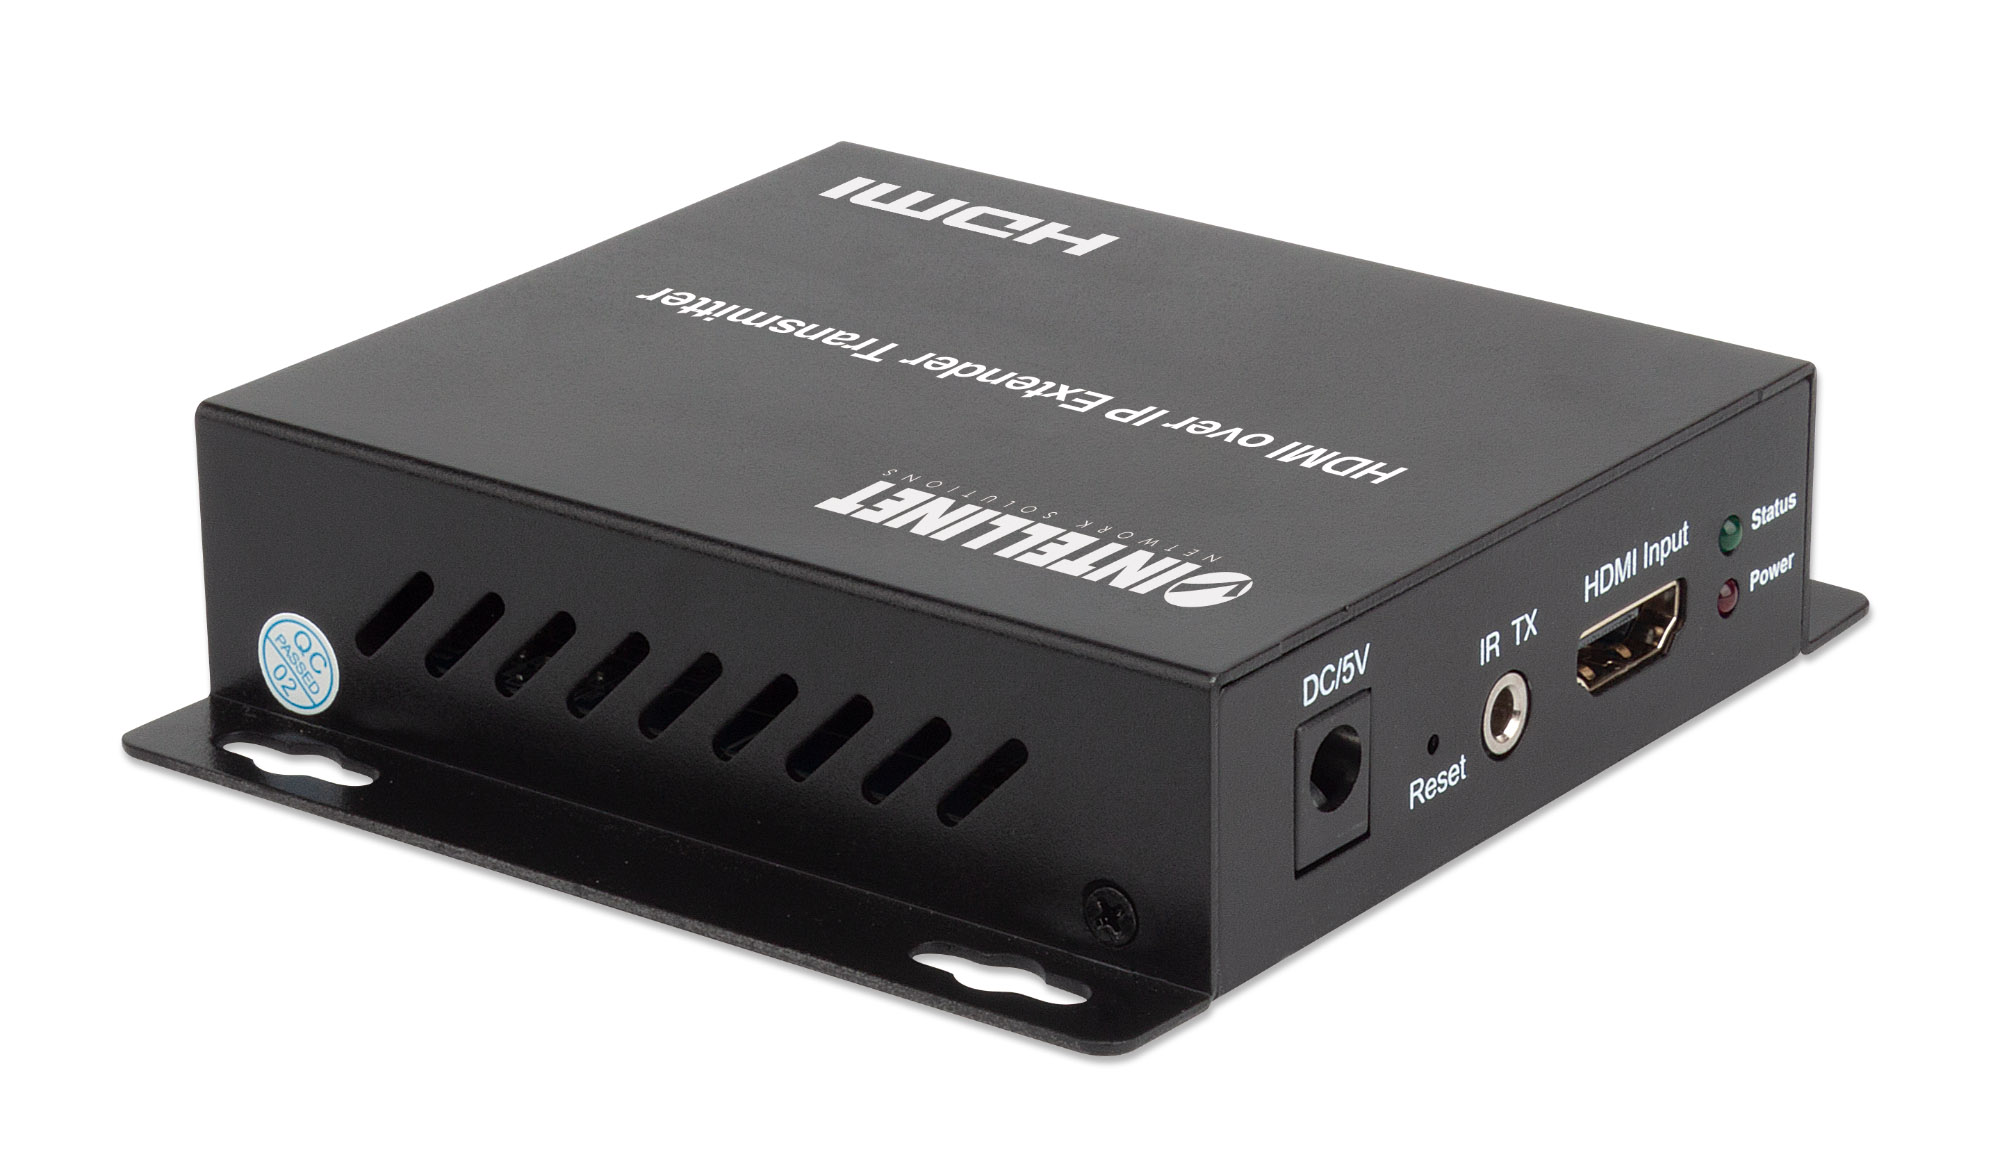 HDMI over IP Extender Transmitter